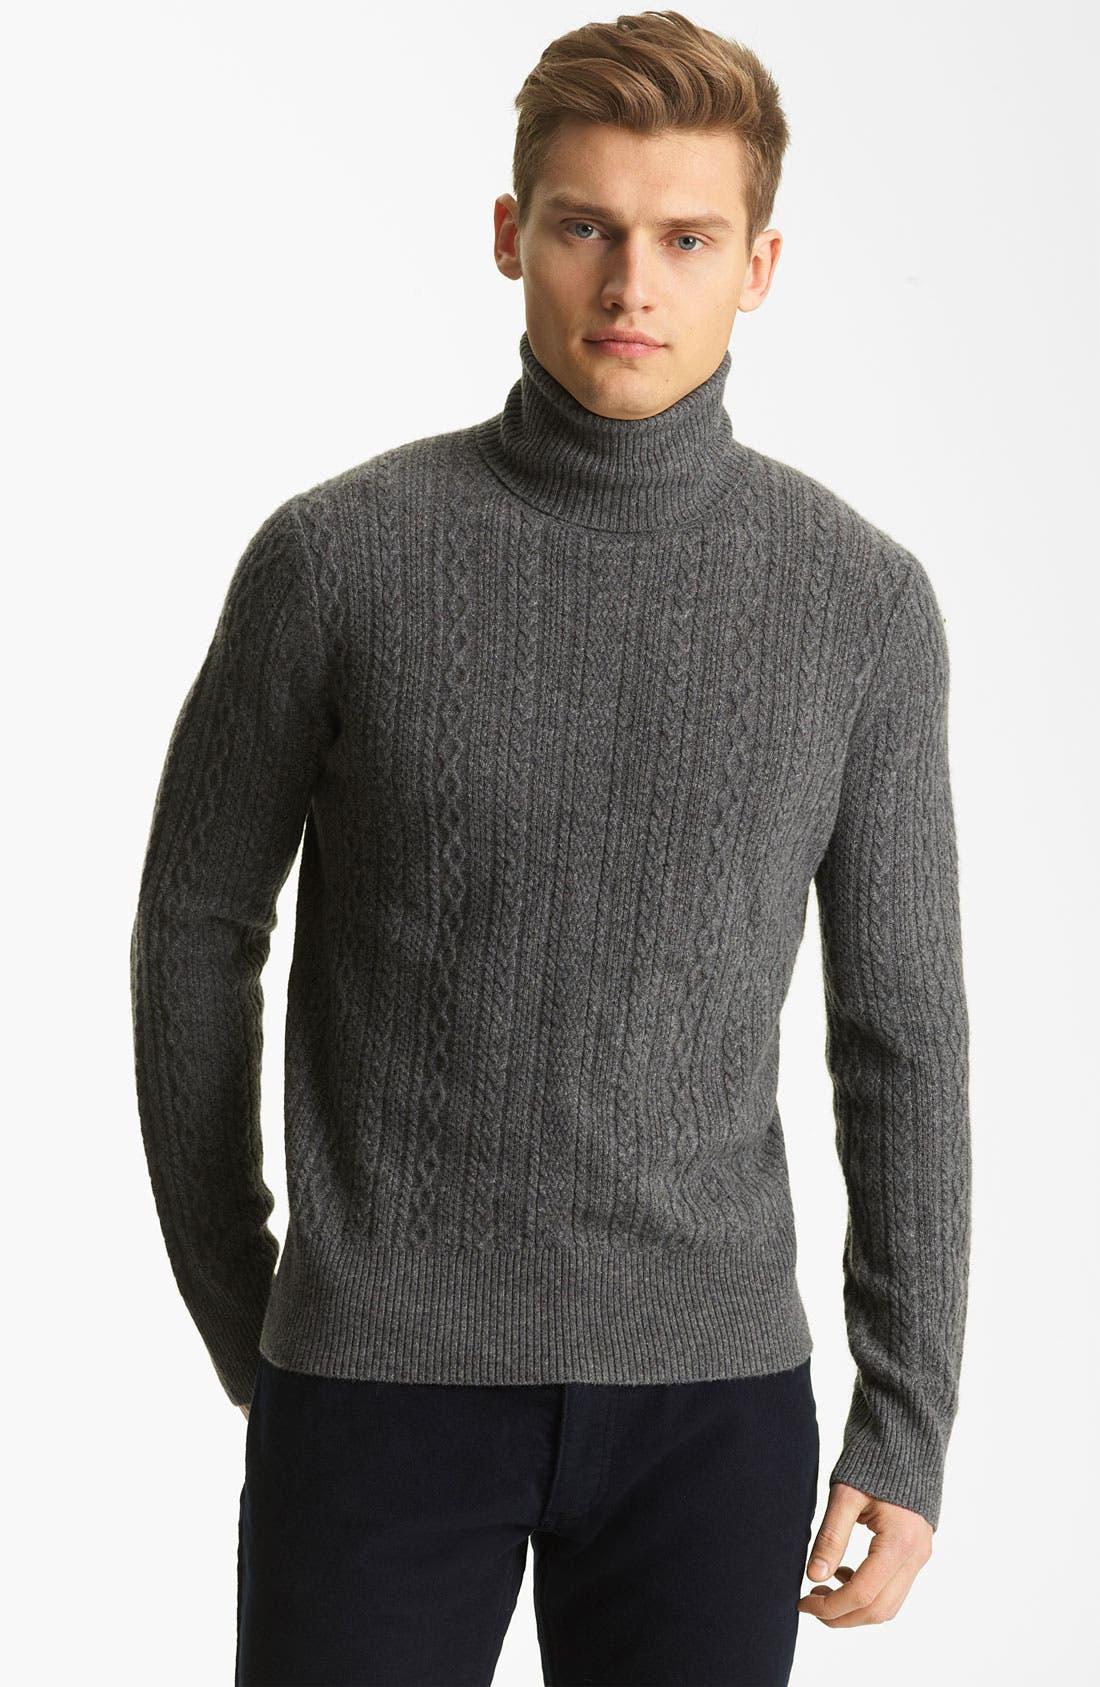 Main Image - Billy Reid 'Elton' Cashmere Turtleneck Sweater